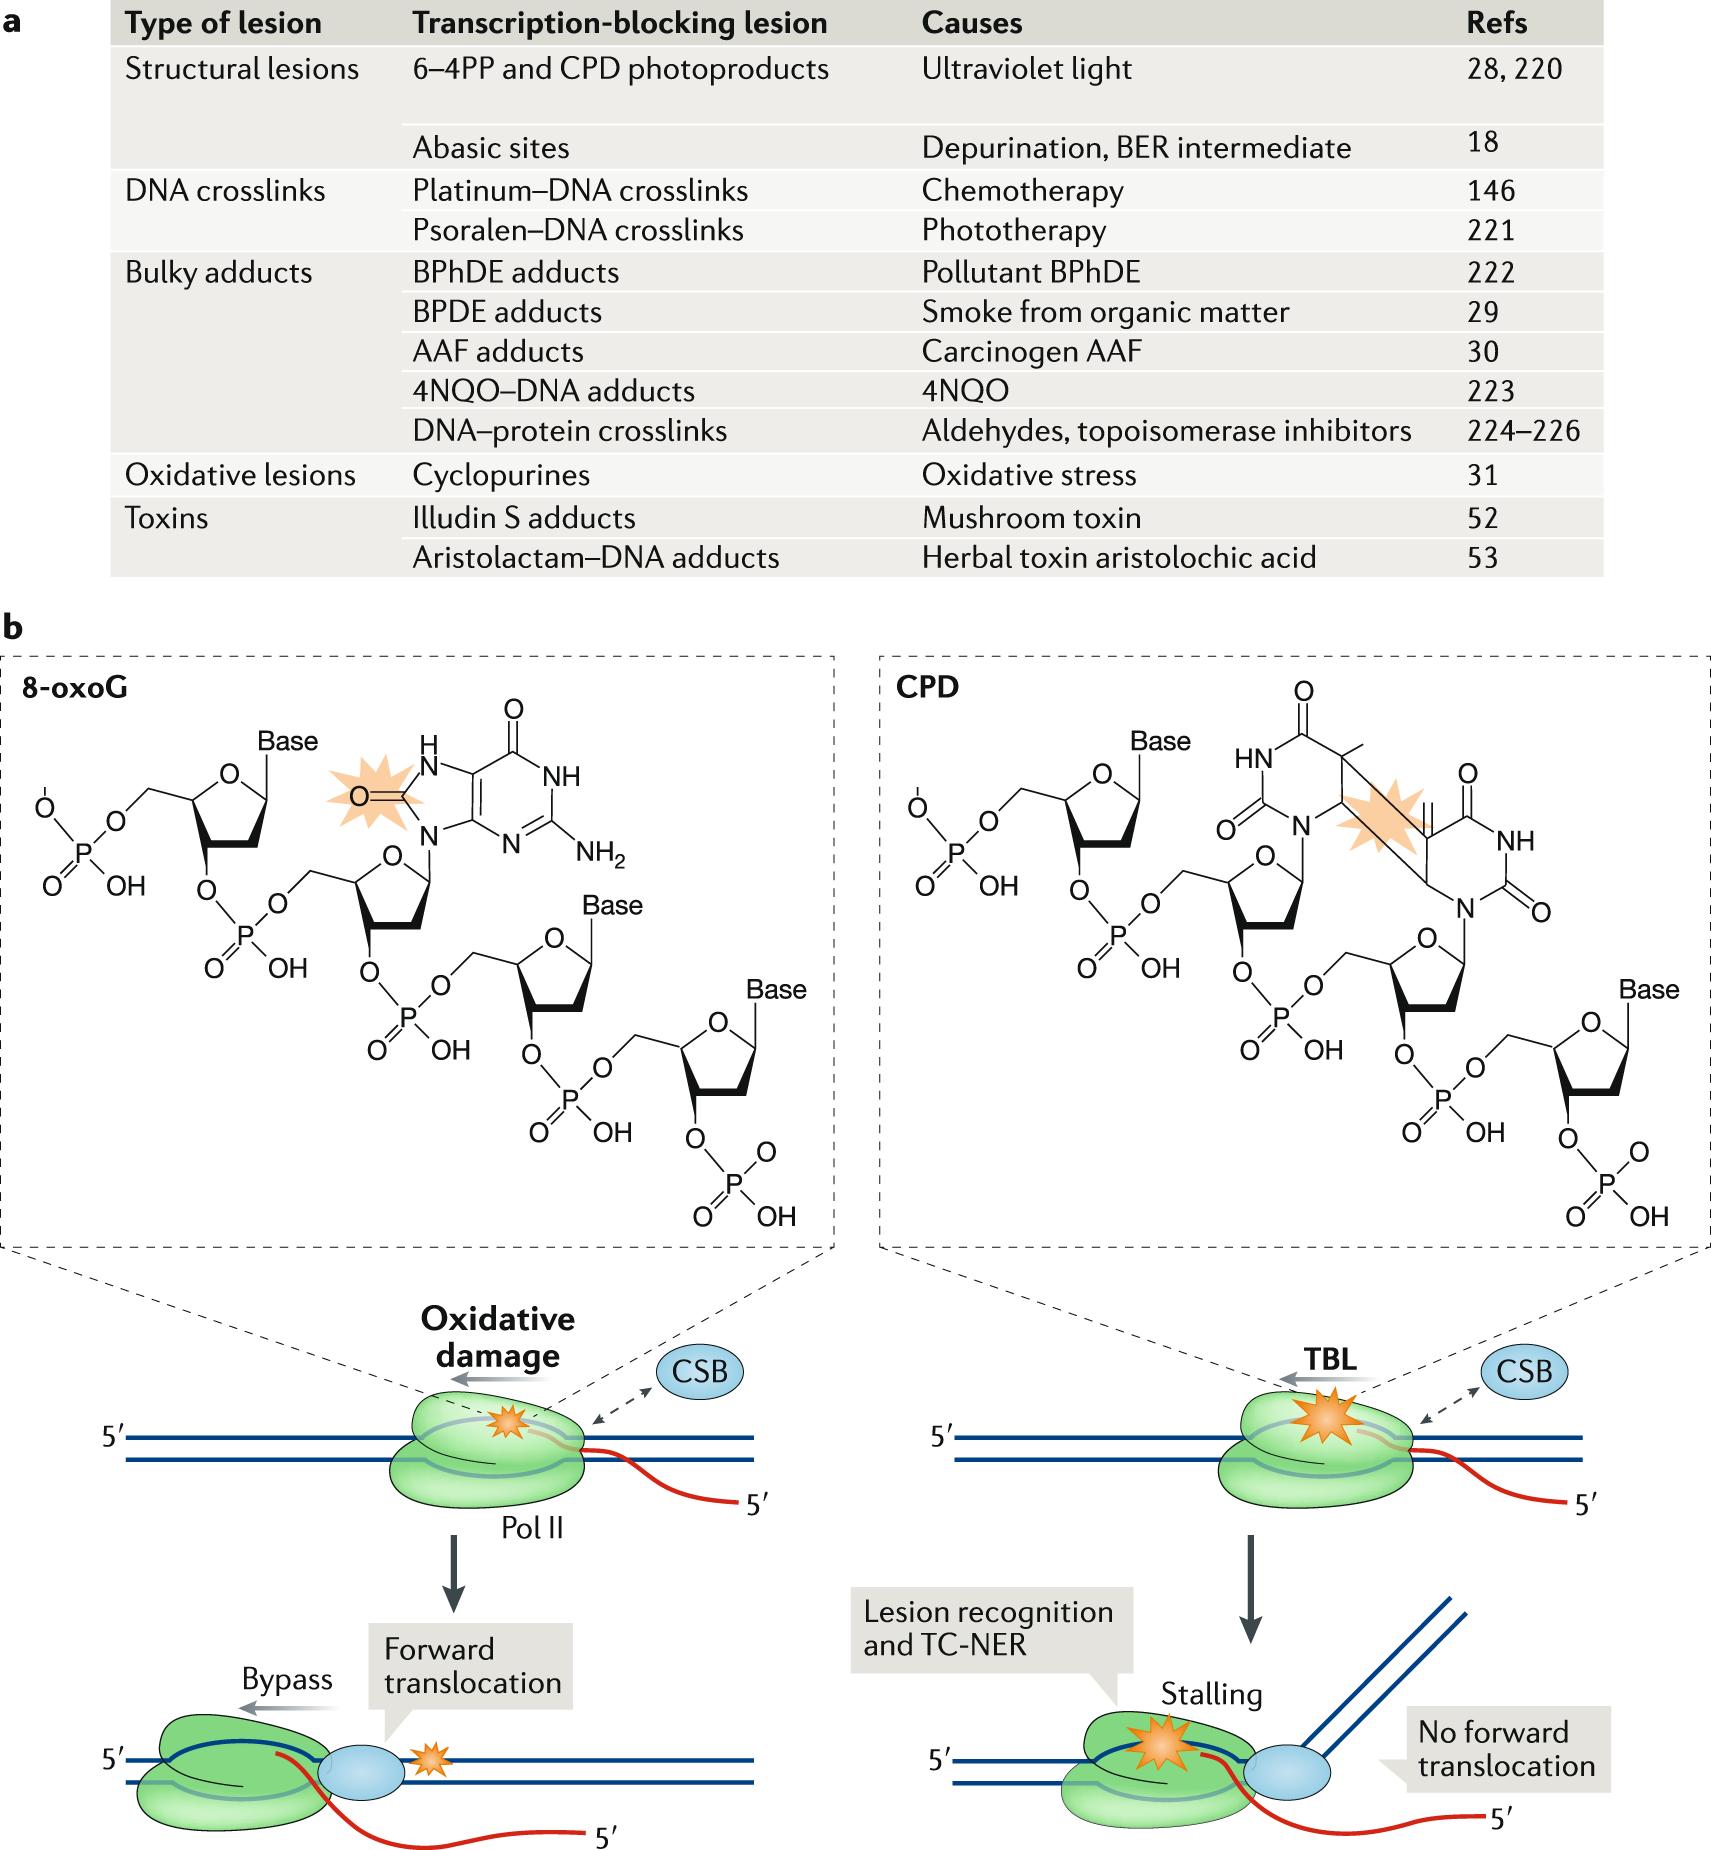 The DNA damage response to transcription stress